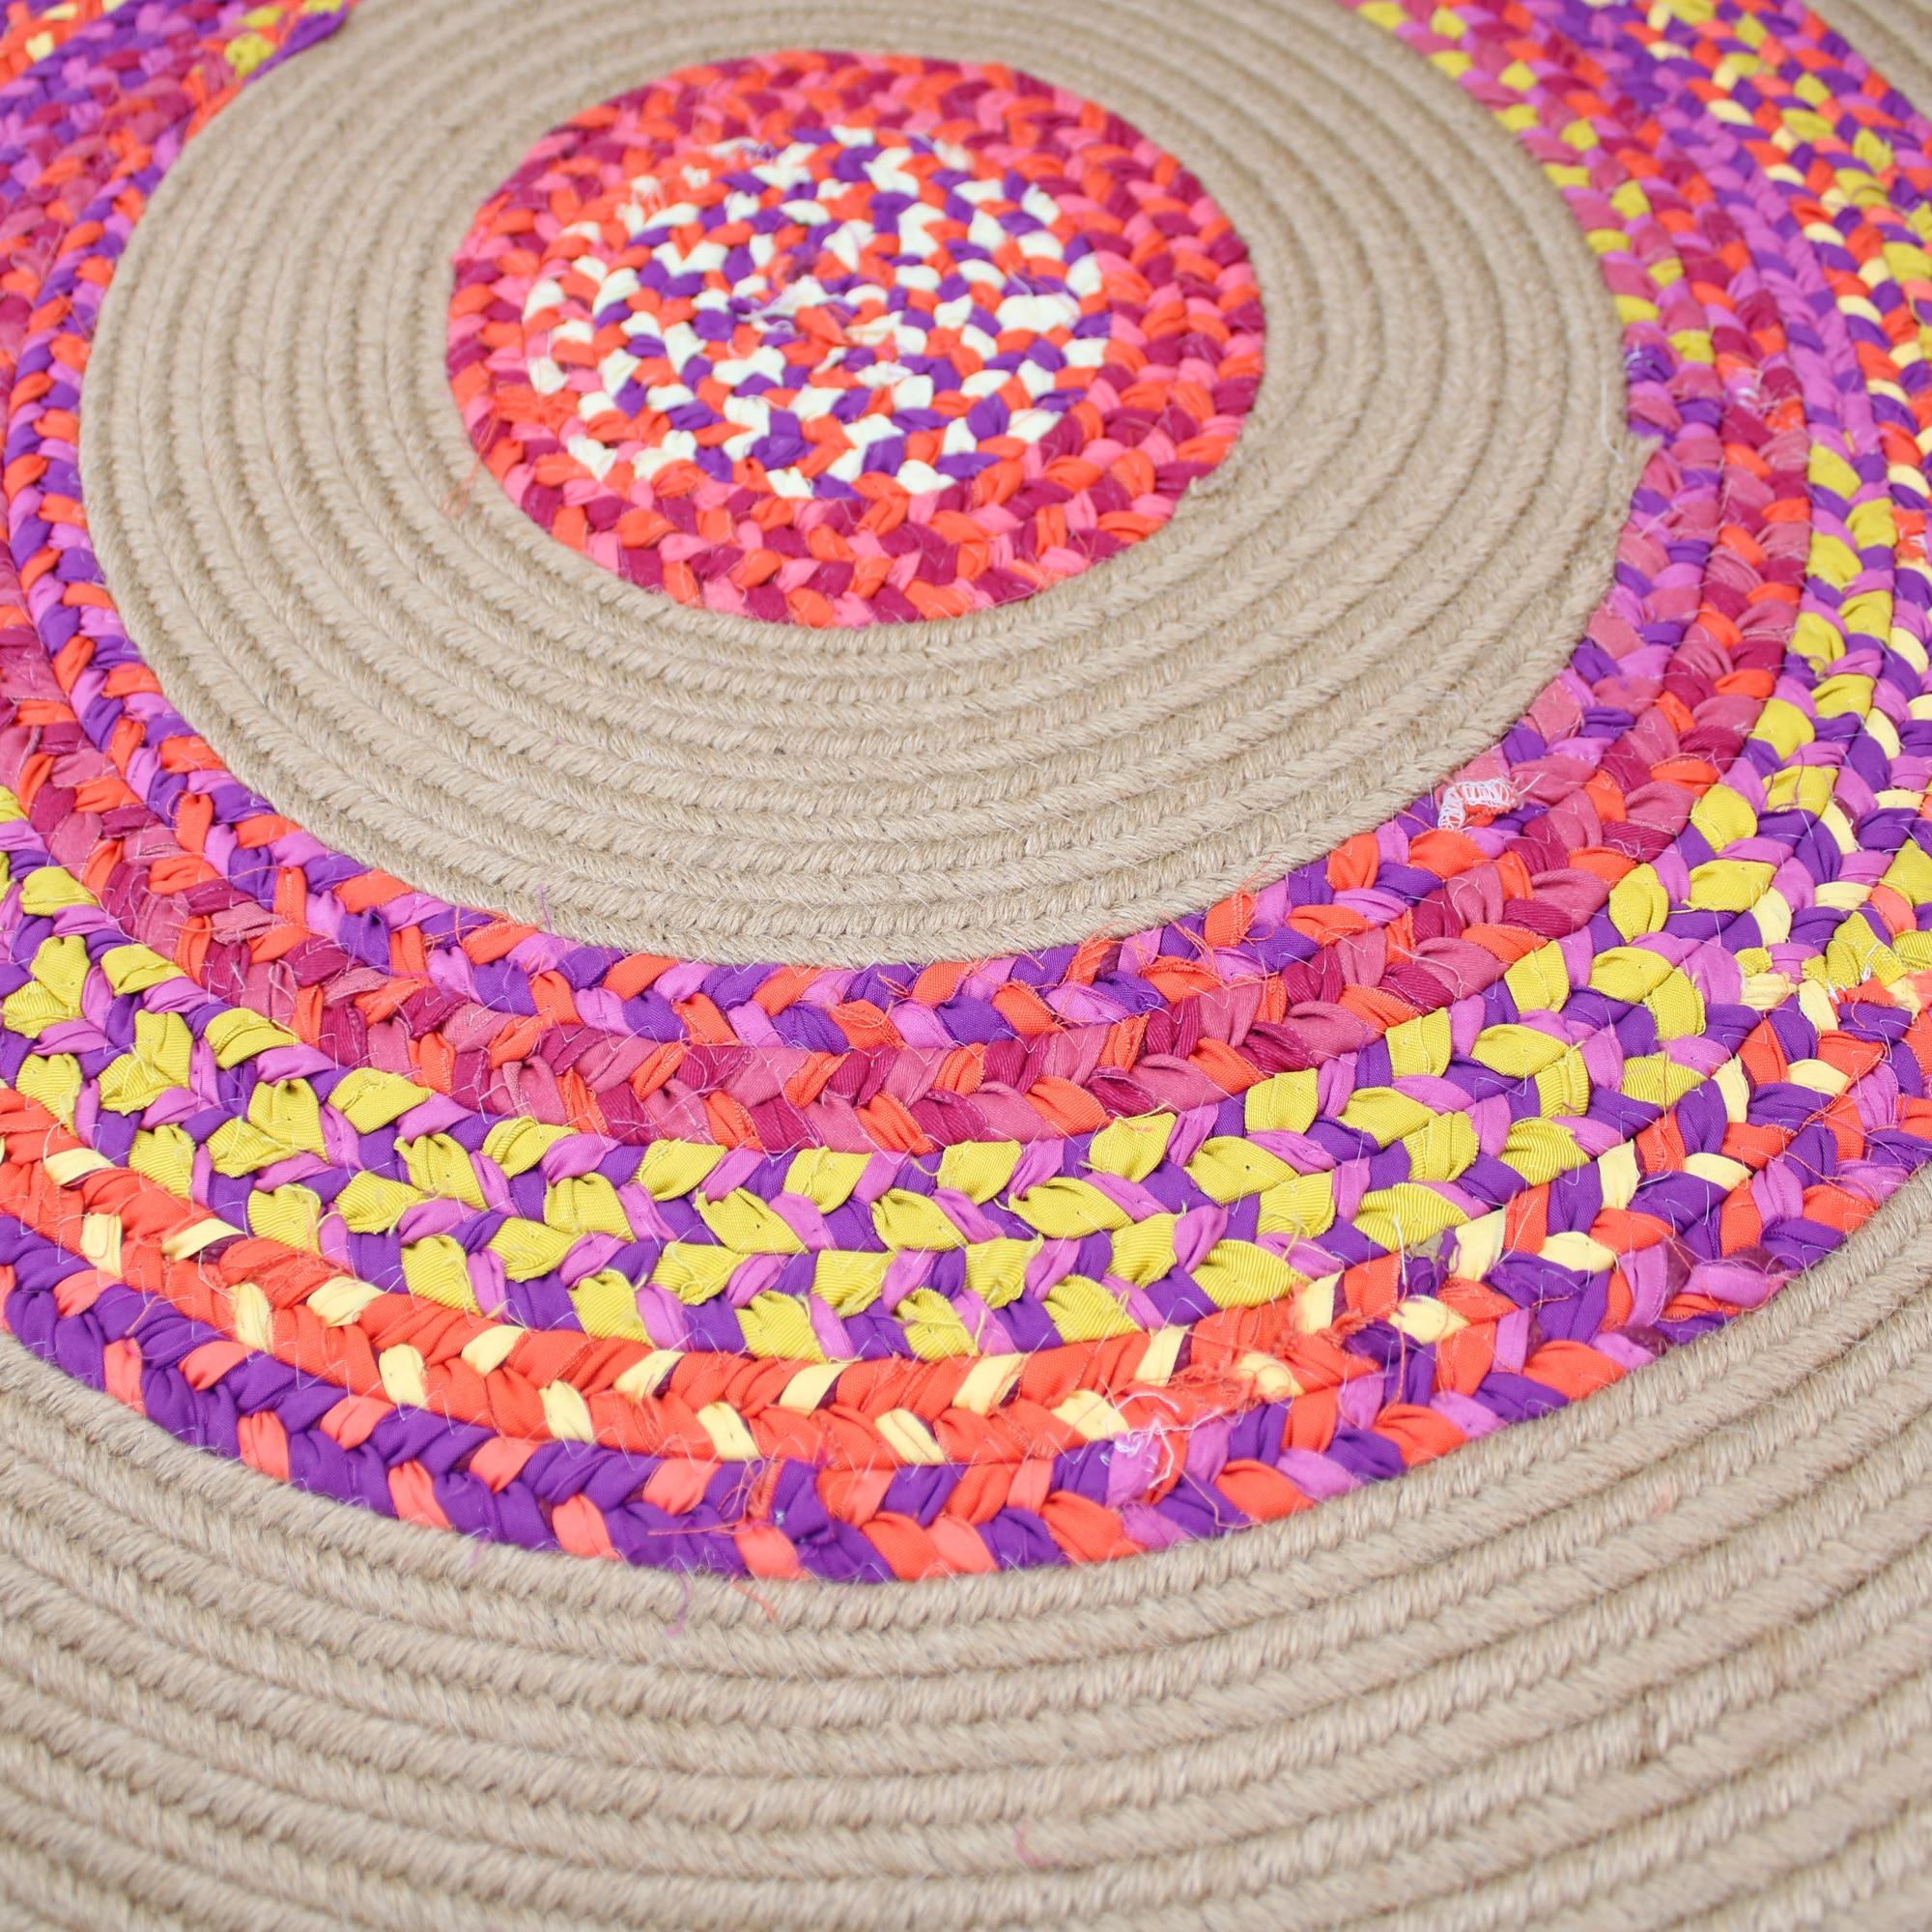 Jute & Cotton Multi Chindi Braid Rug Hand Woven Reversible Round Carpet Handmade Braided Cotton Round Area Rug for Living Room - 3